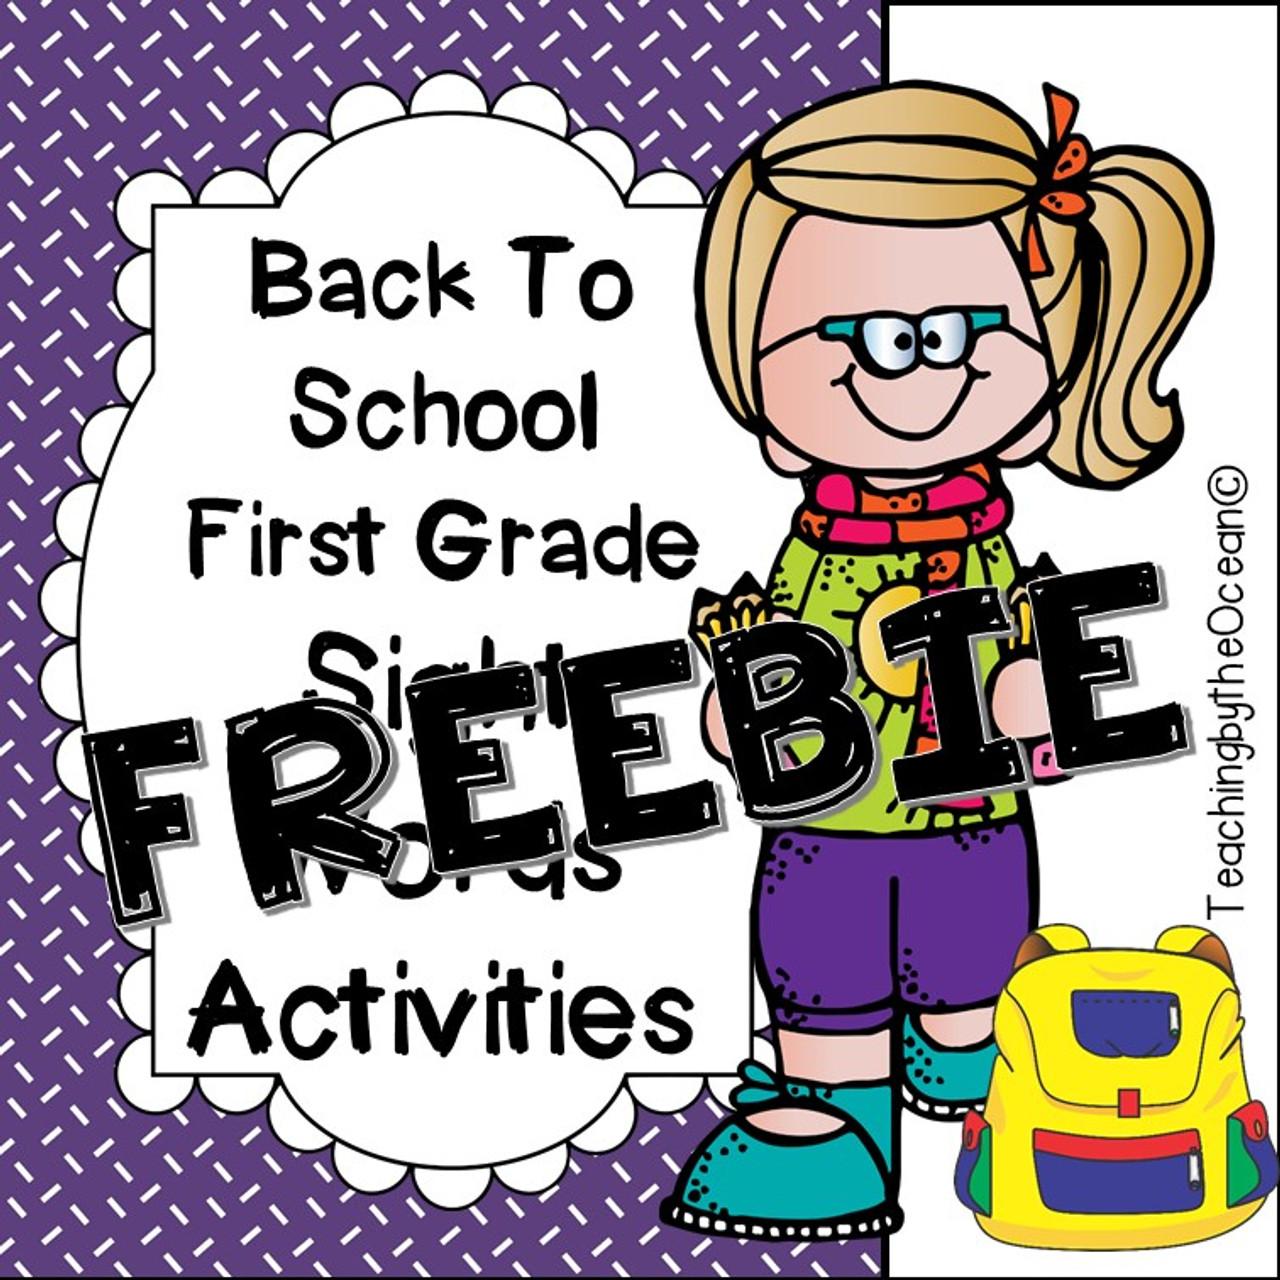 First Grade Sight Words Activities - Back to School Themed FREEBI [ 1280 x 1280 Pixel ]